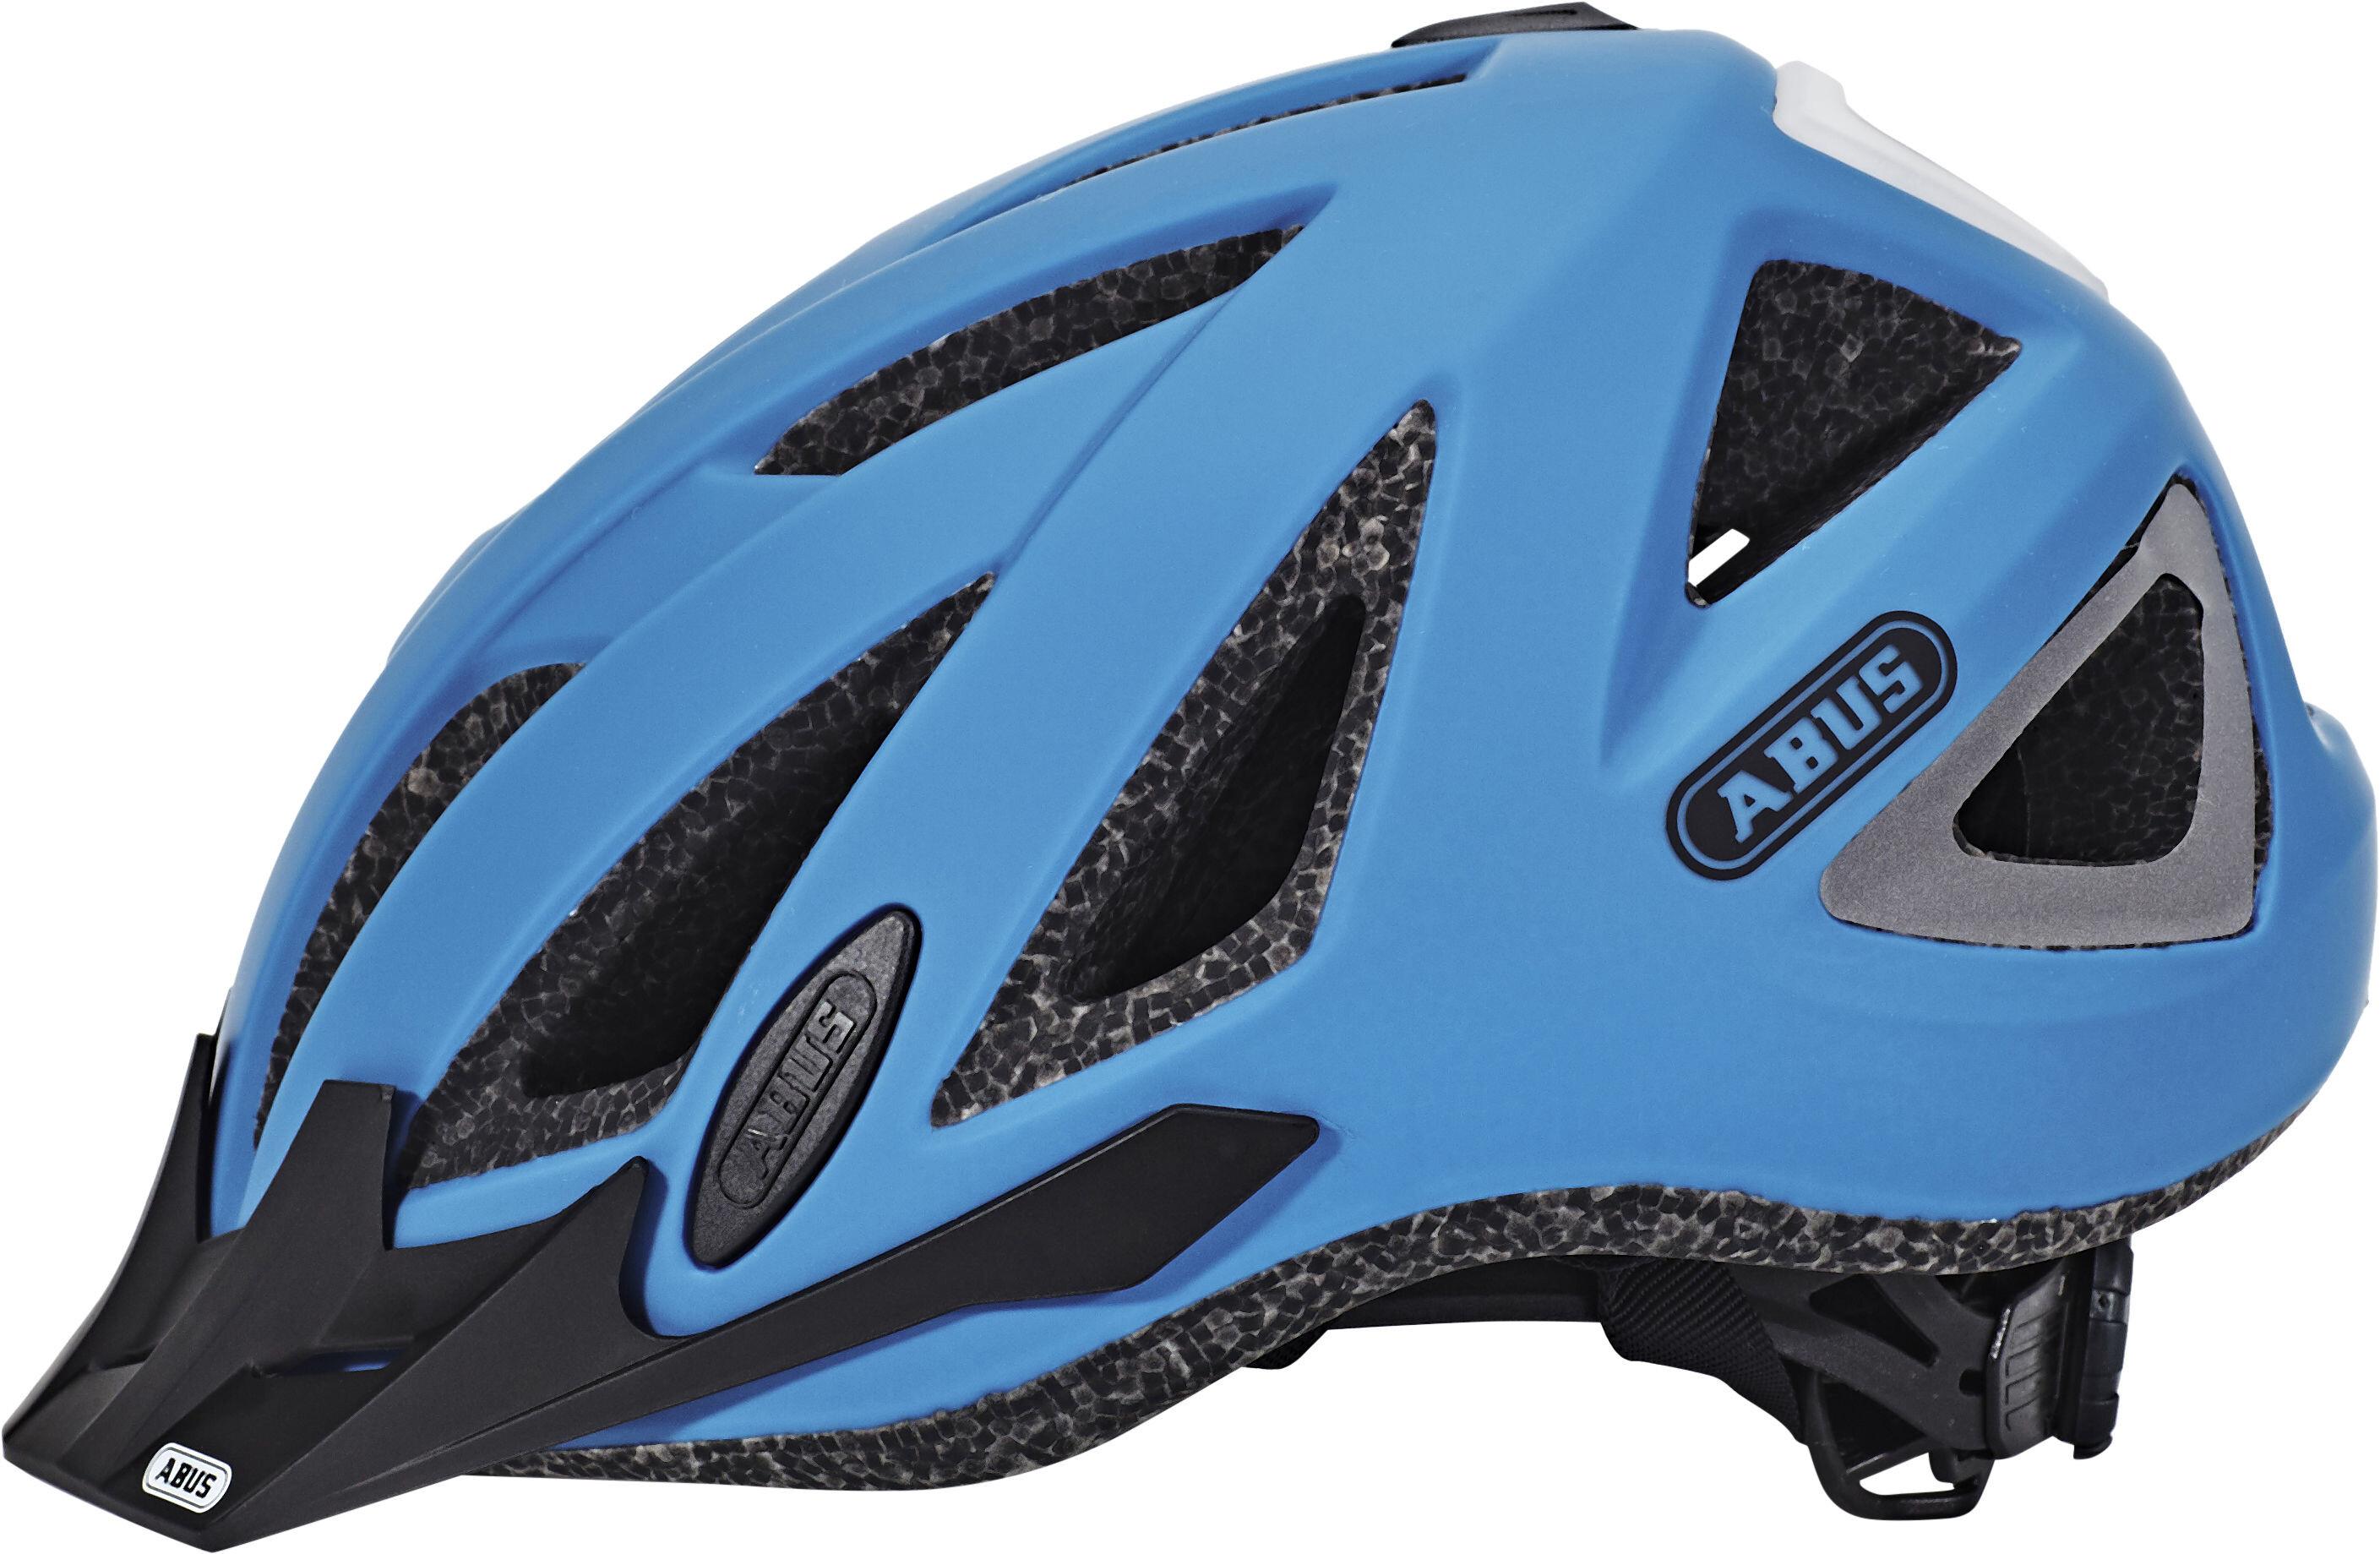 abus urban i 2 0 casco de bicicleta azul. Black Bedroom Furniture Sets. Home Design Ideas